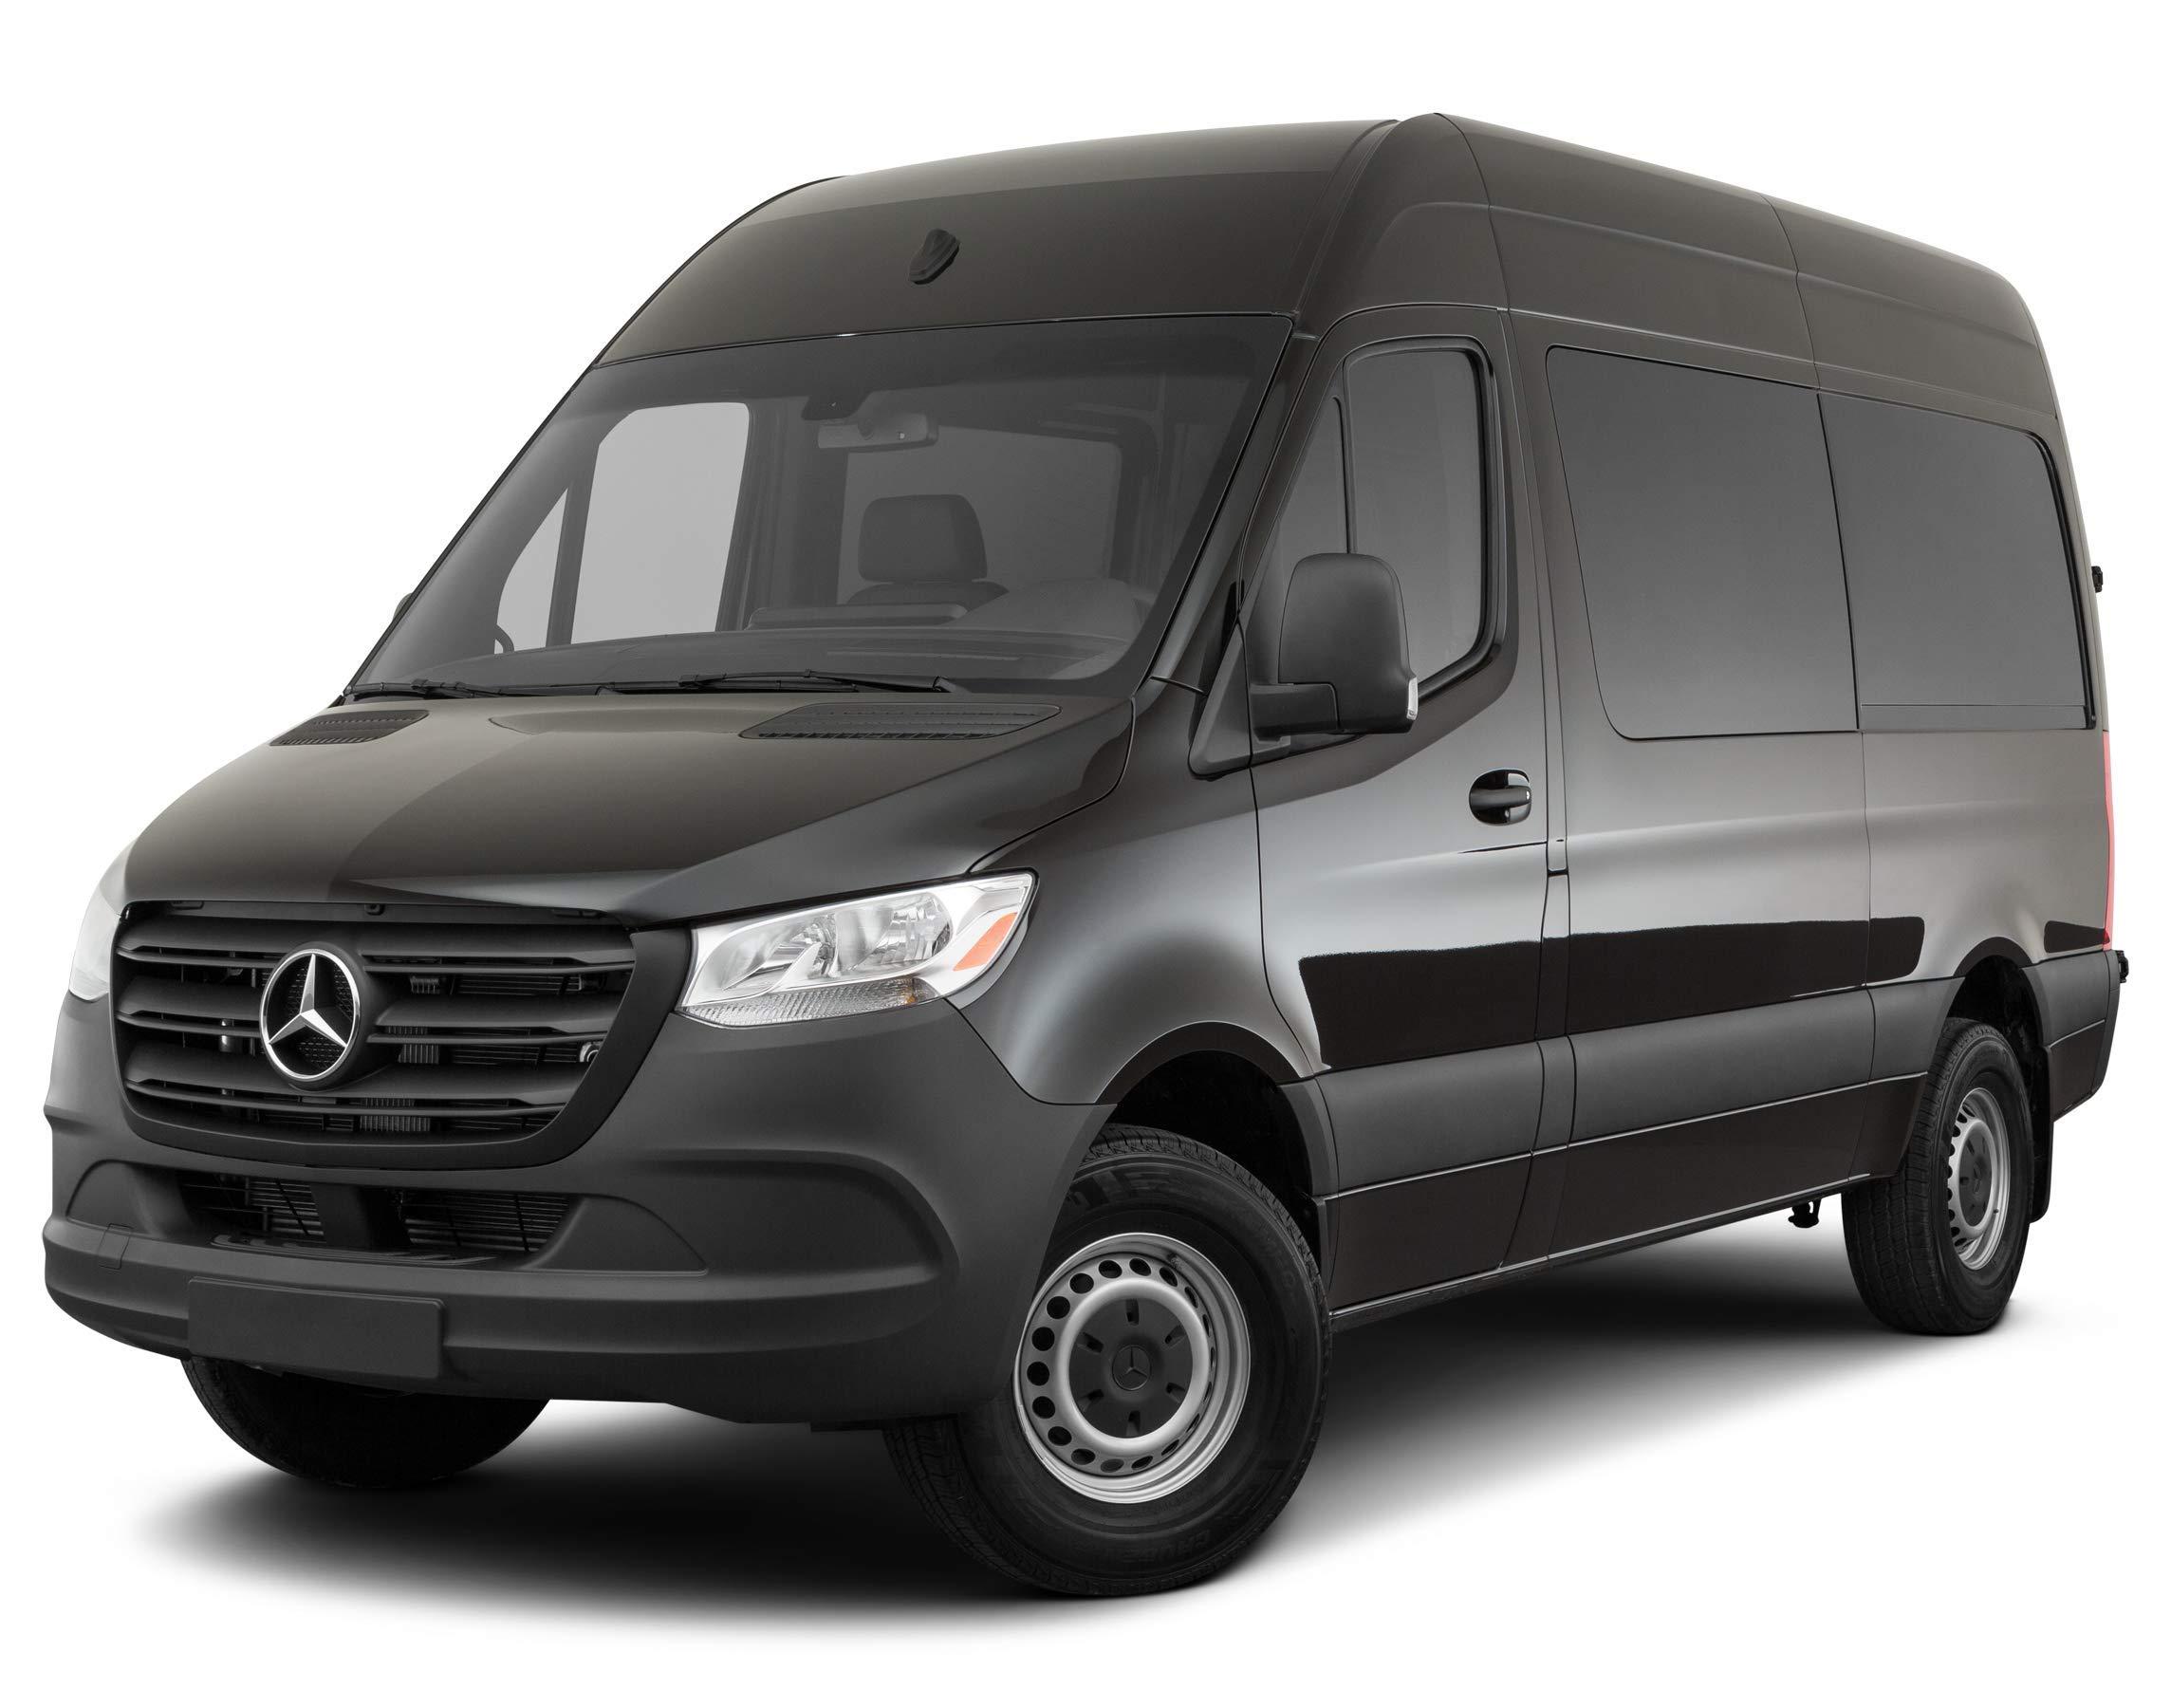 Mercedes Van Price >> Amazon Com 2019 Mercedes Benz Sprinter 2500 Reviews Images